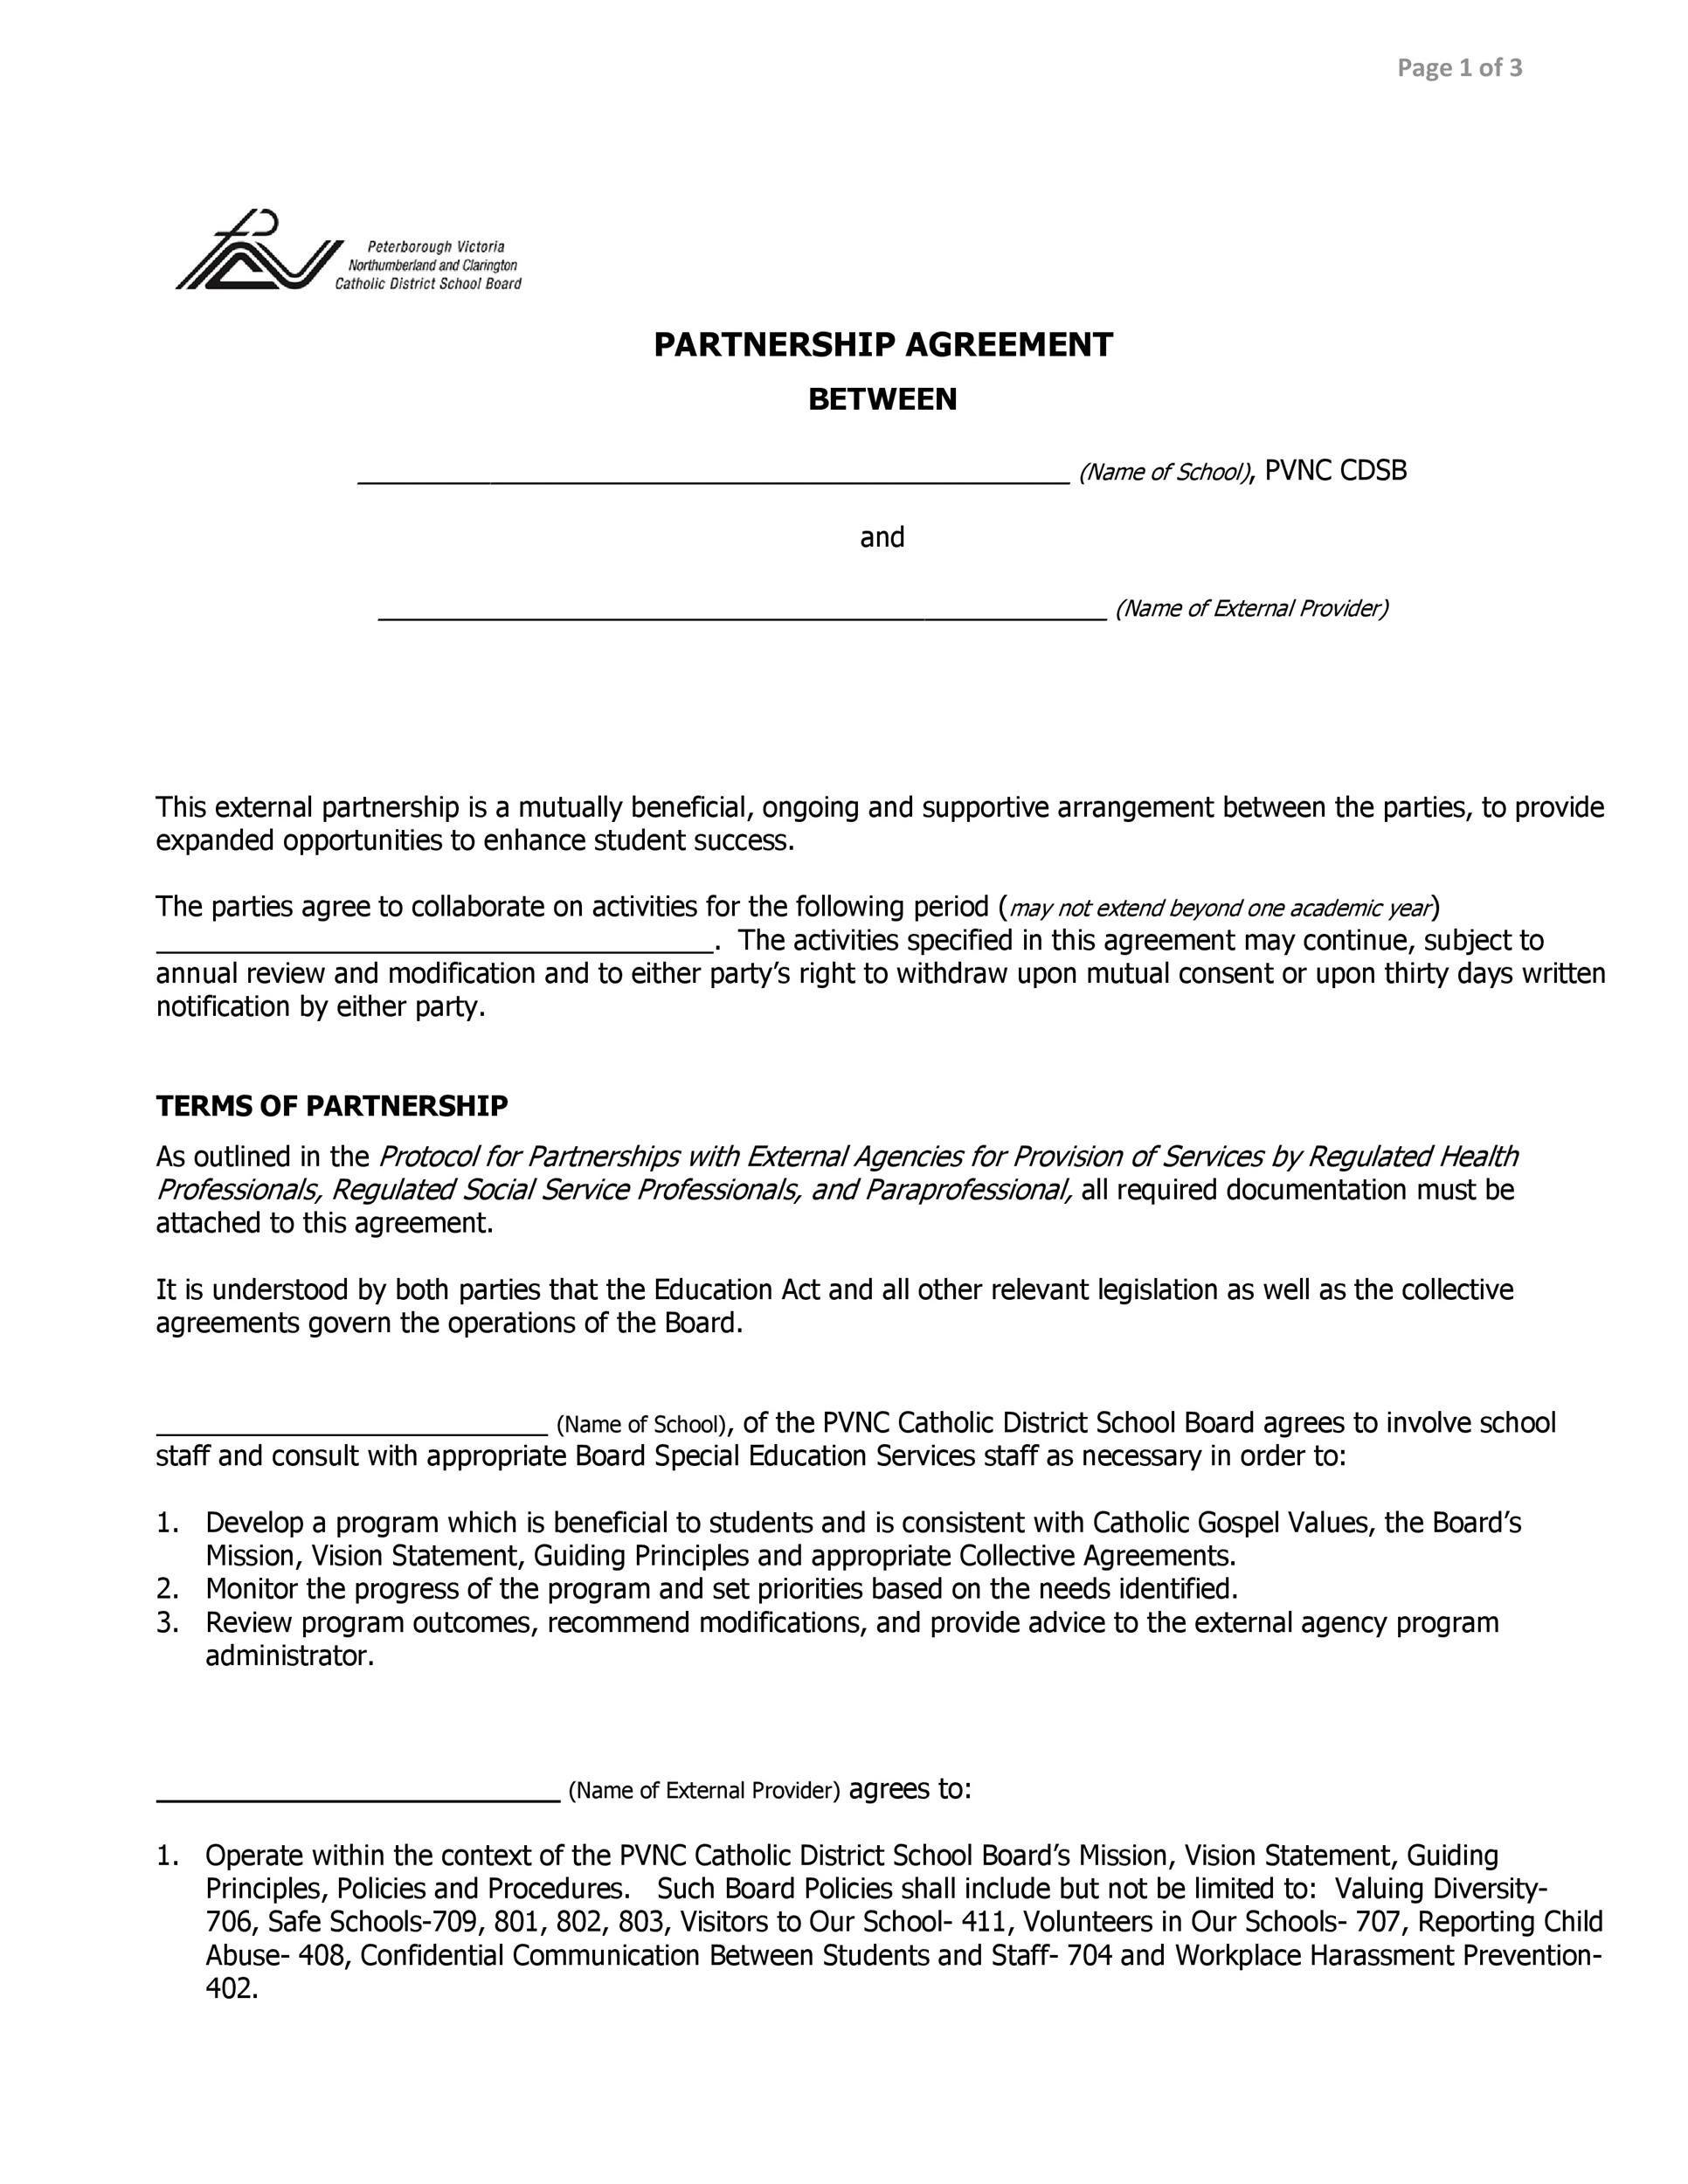 007 Amazing Limited Company Partnership Agreement Template Uk Inspiration Full